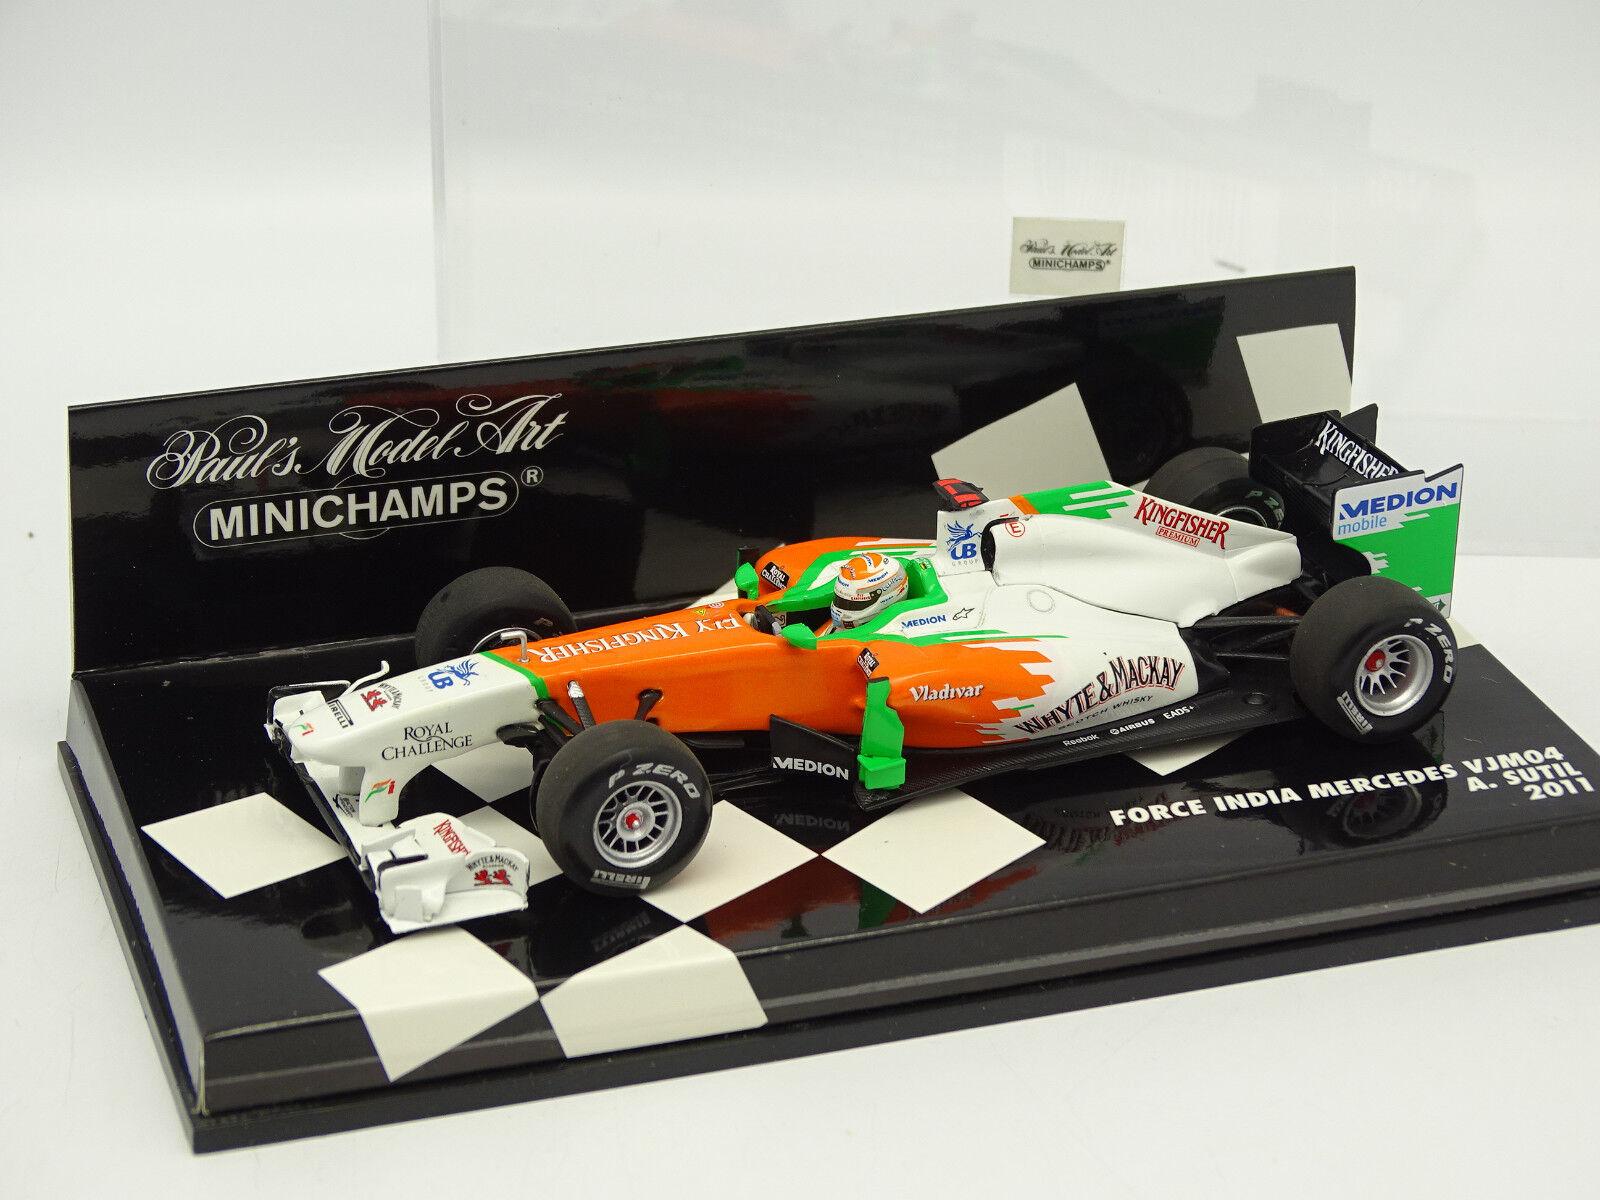 Minichamps 1 43 - F1 Force India Mercedes VJM04 Sutil 2011